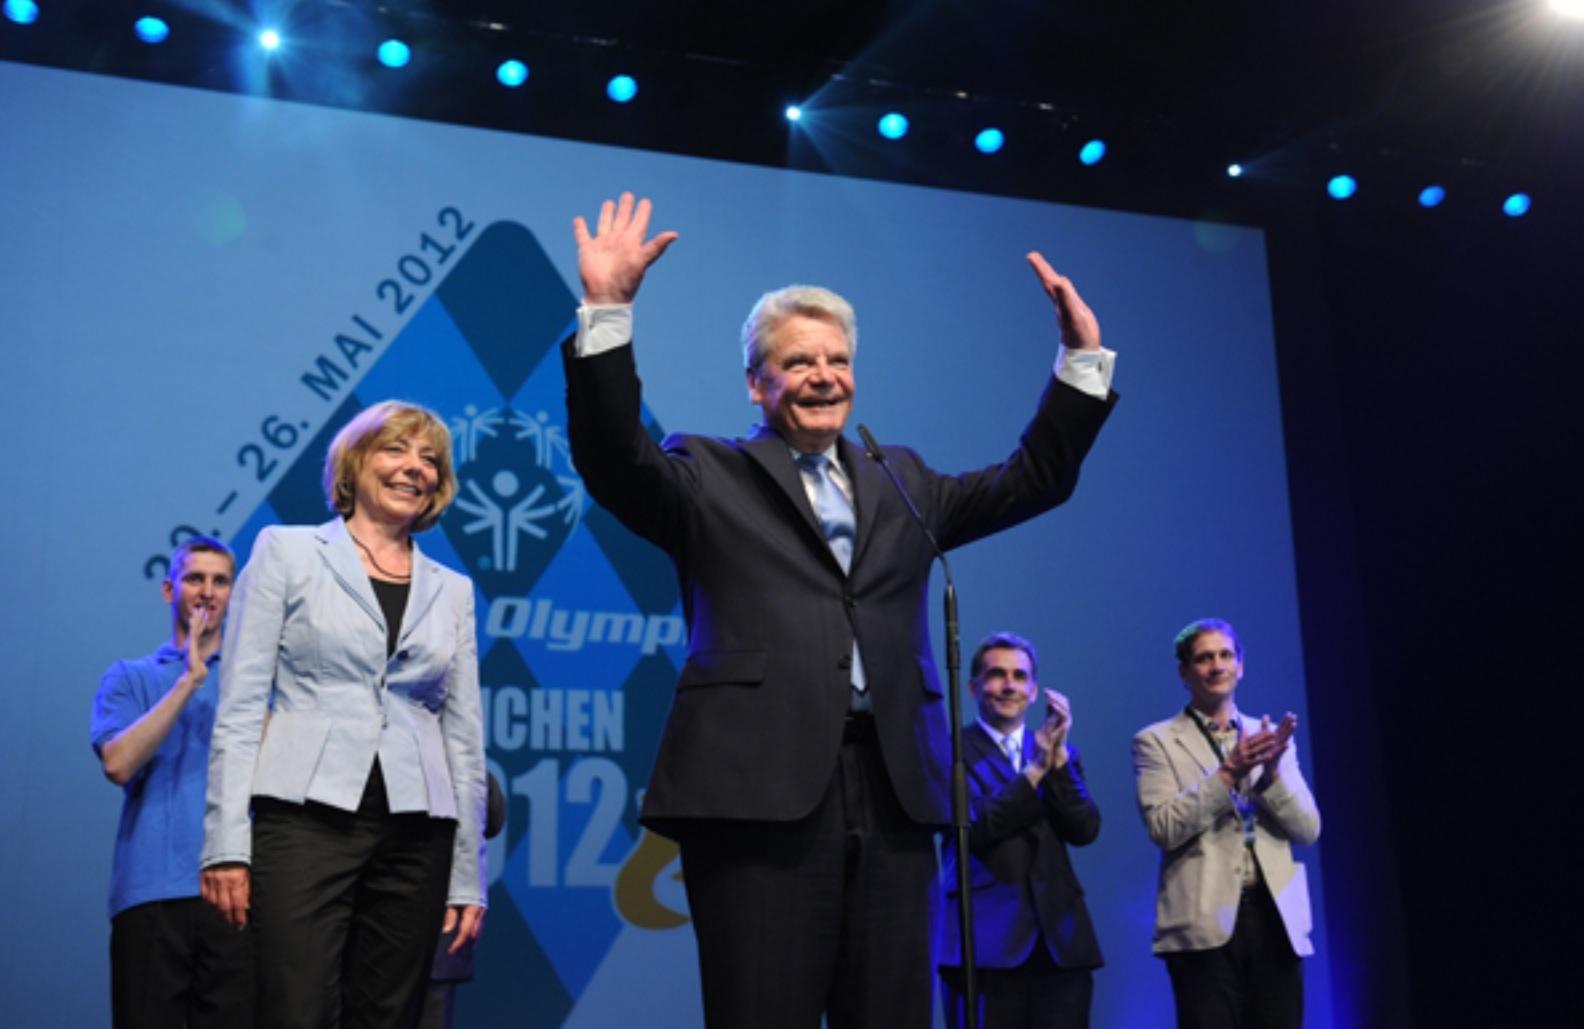 2012 hat Bundespräsident Gauck die Special Olympics eröffnet